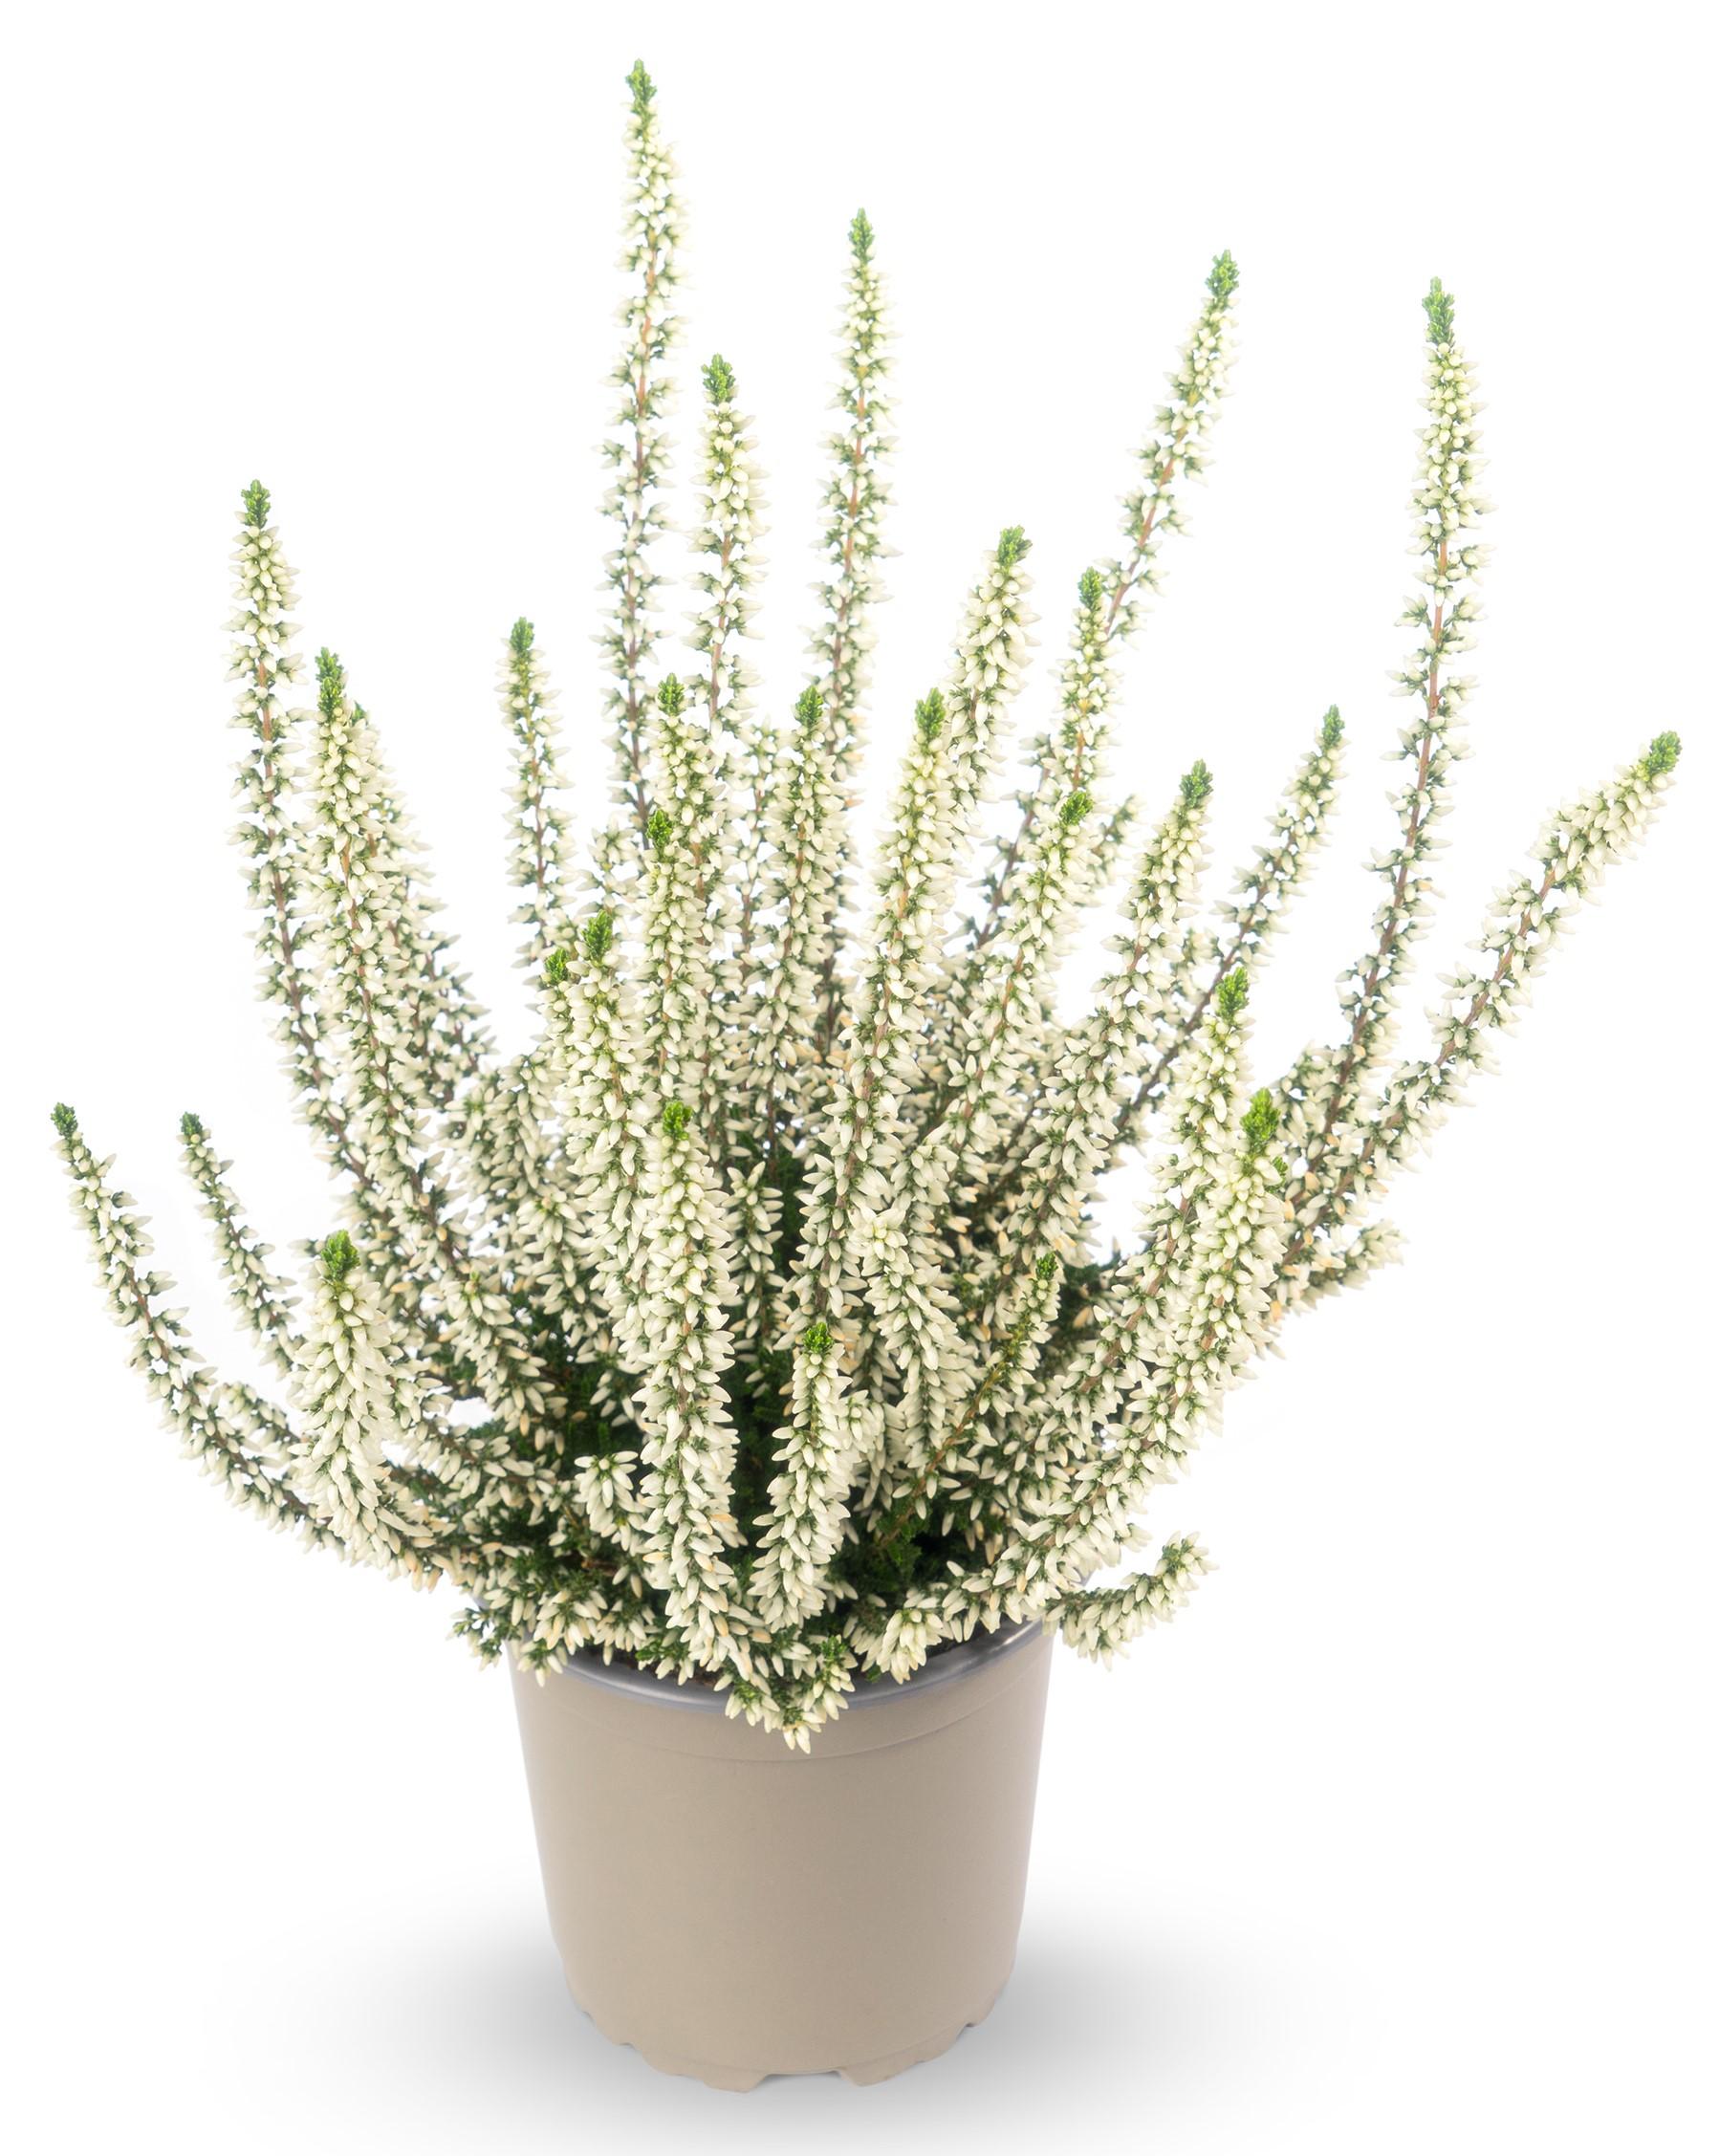 Knospenheide (Calluna vulgaris) Gardengirls® Emma - weiß